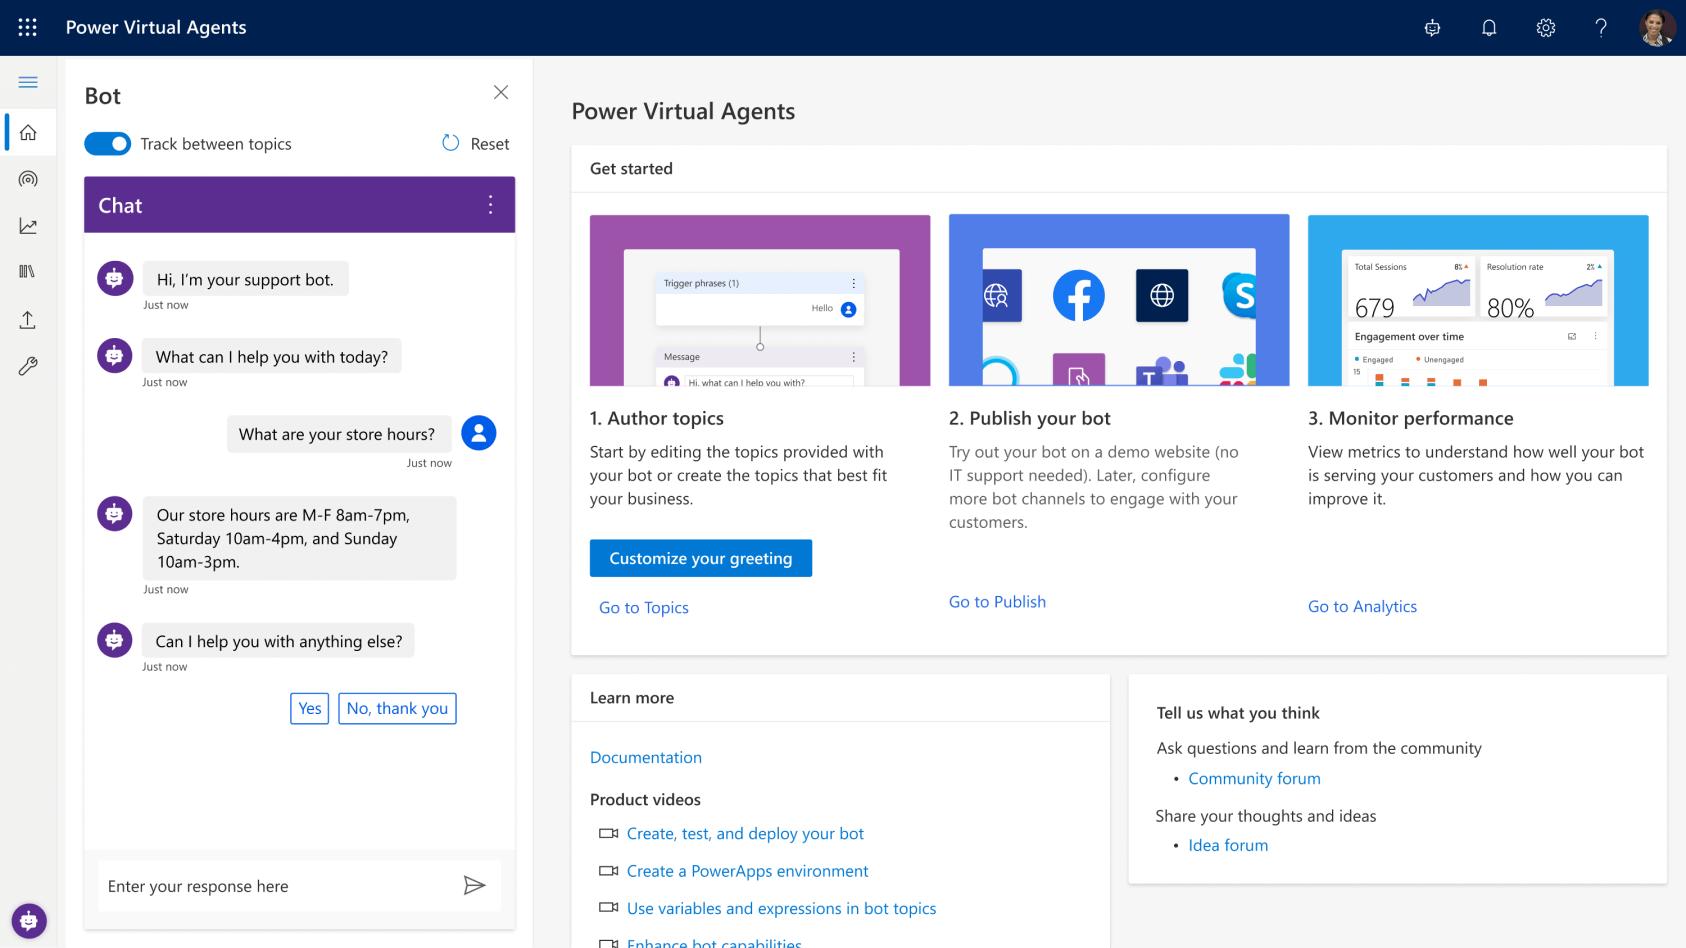 Microsoft Power Agents Screenshot